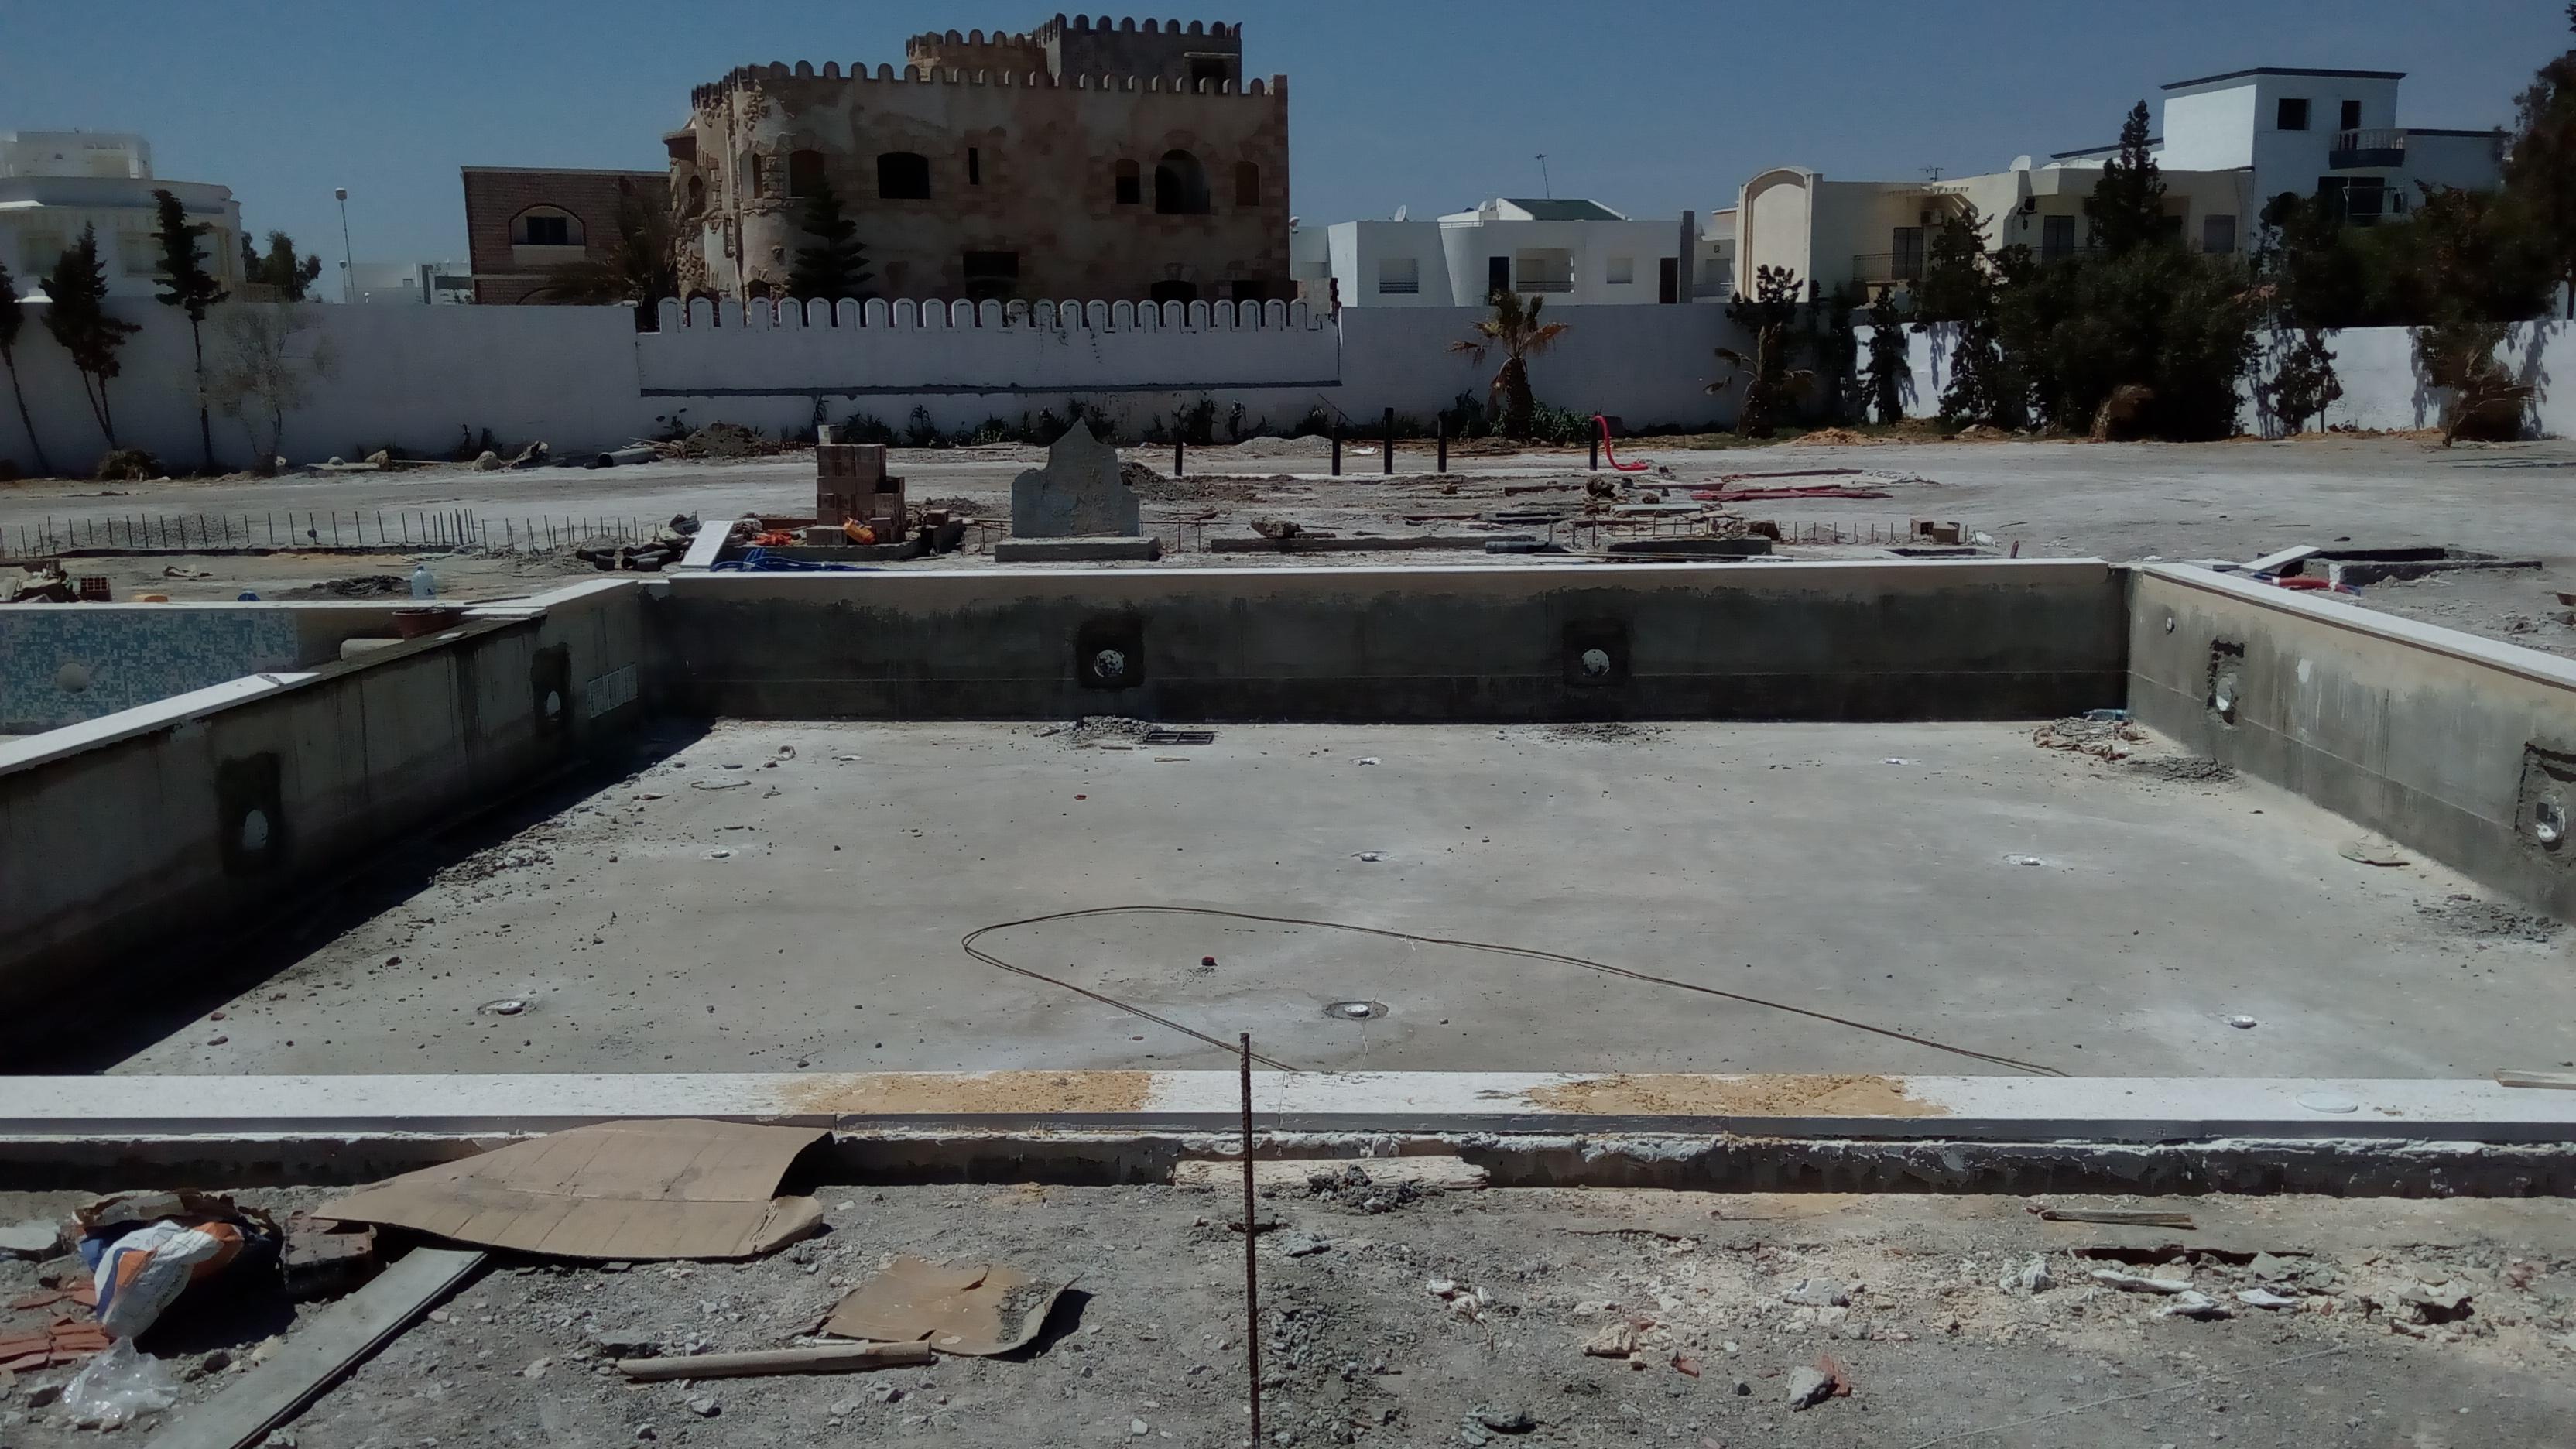 Keeping the Salt Out: PENETRON Waterproofs Mediterranean Hotel